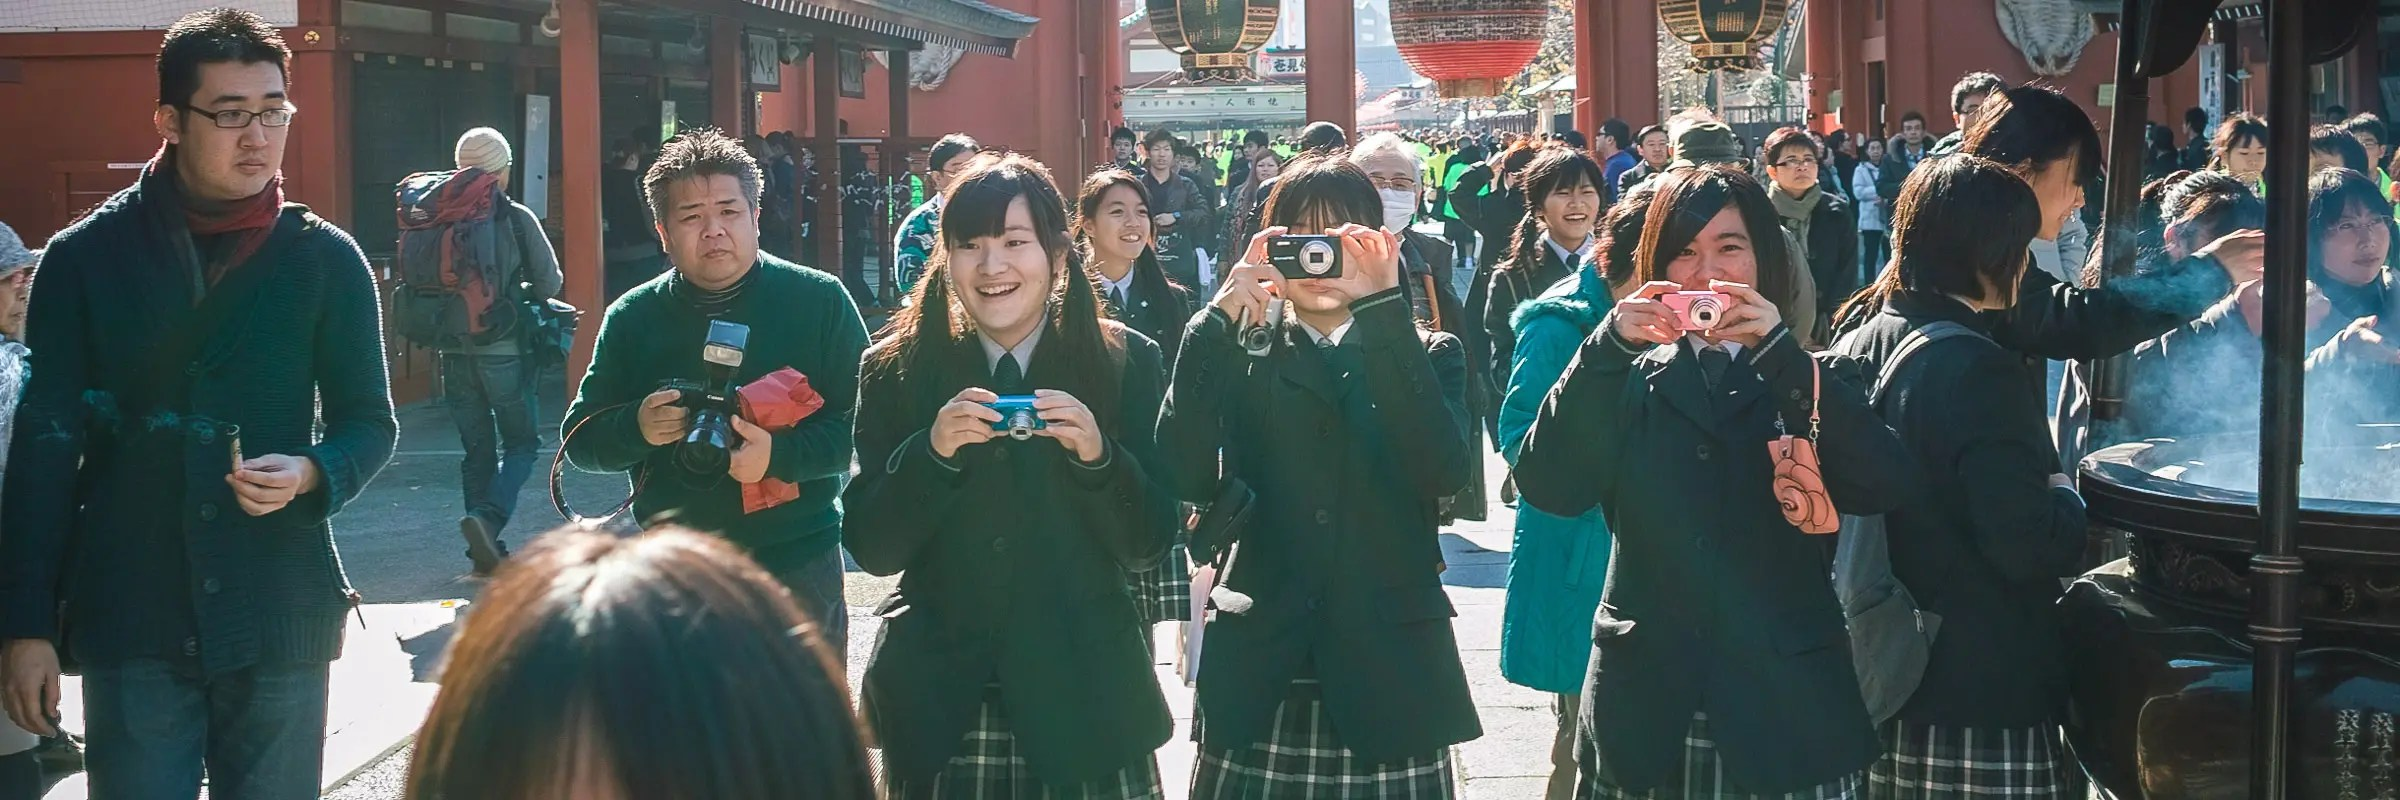 Tokyo Photographers